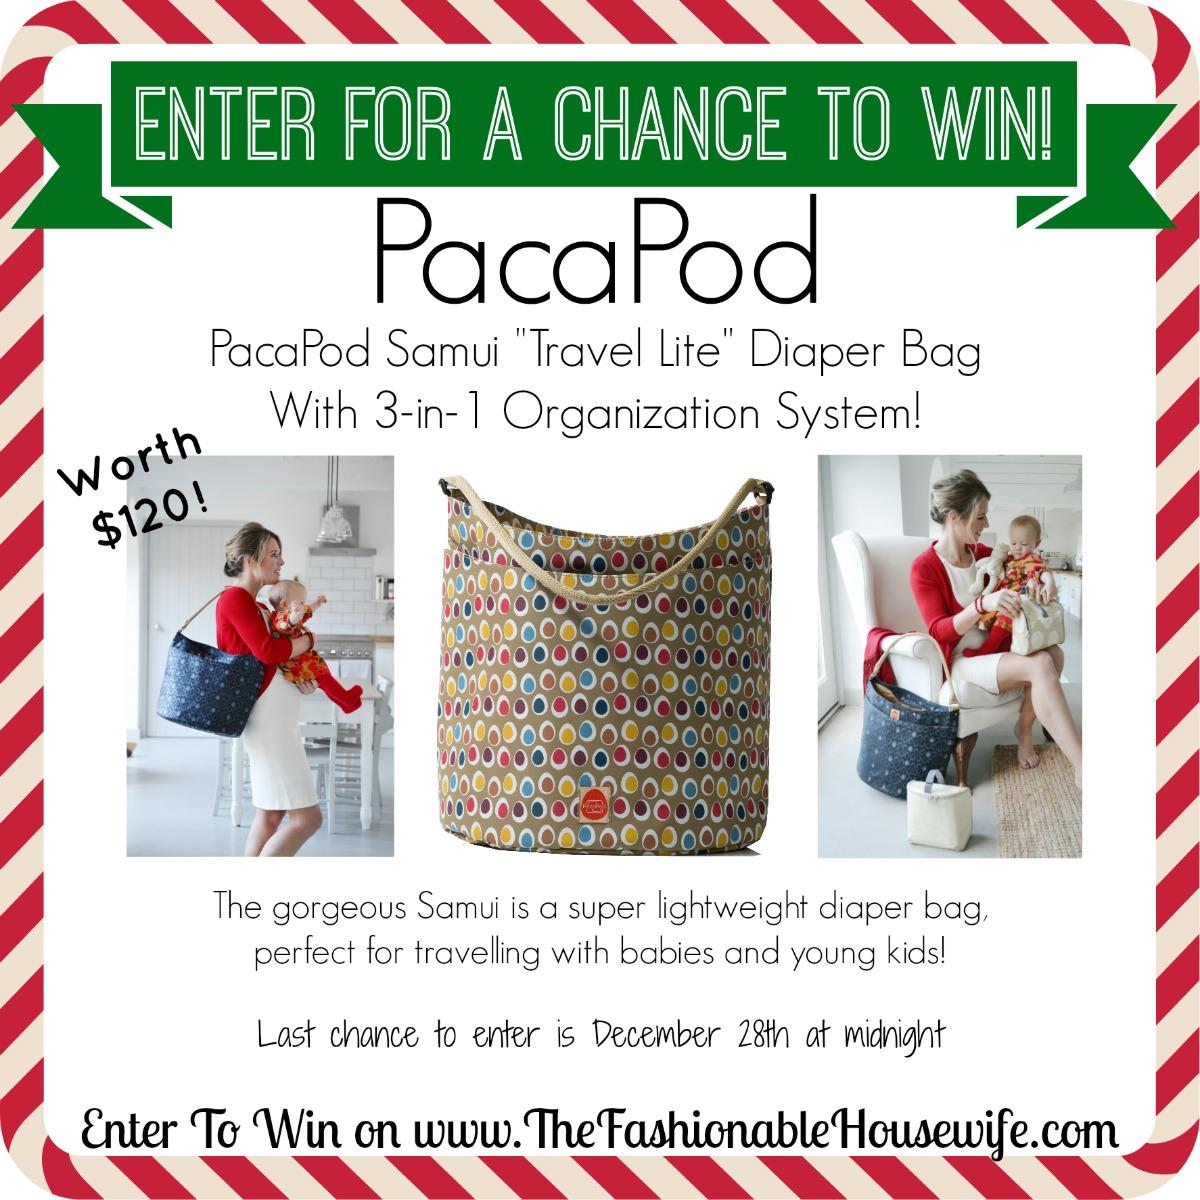 Enter for a chance to win PacaPod Samui Diaper Bag